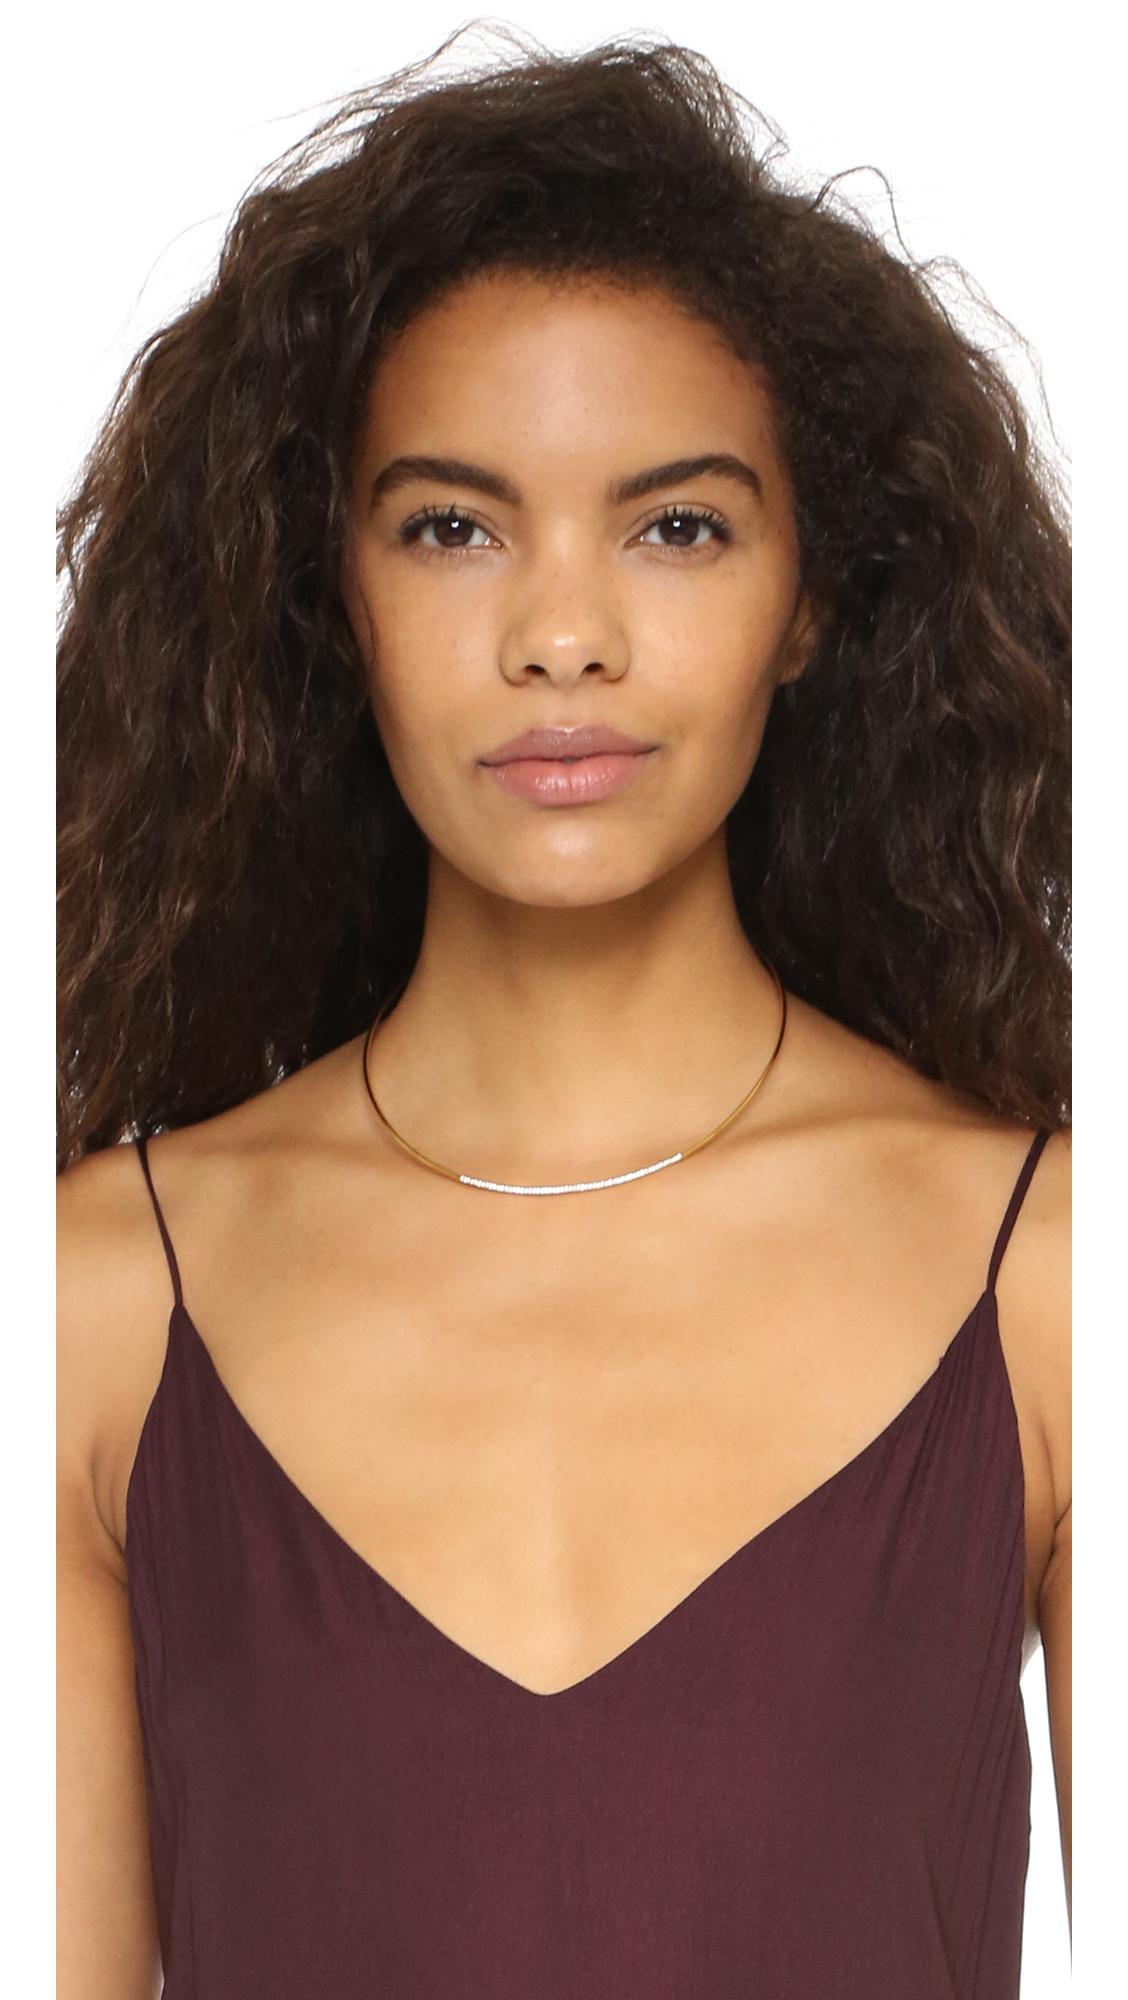 Gorjana Petra Shimmer Collar Necklace - Gold/clear in Metallic